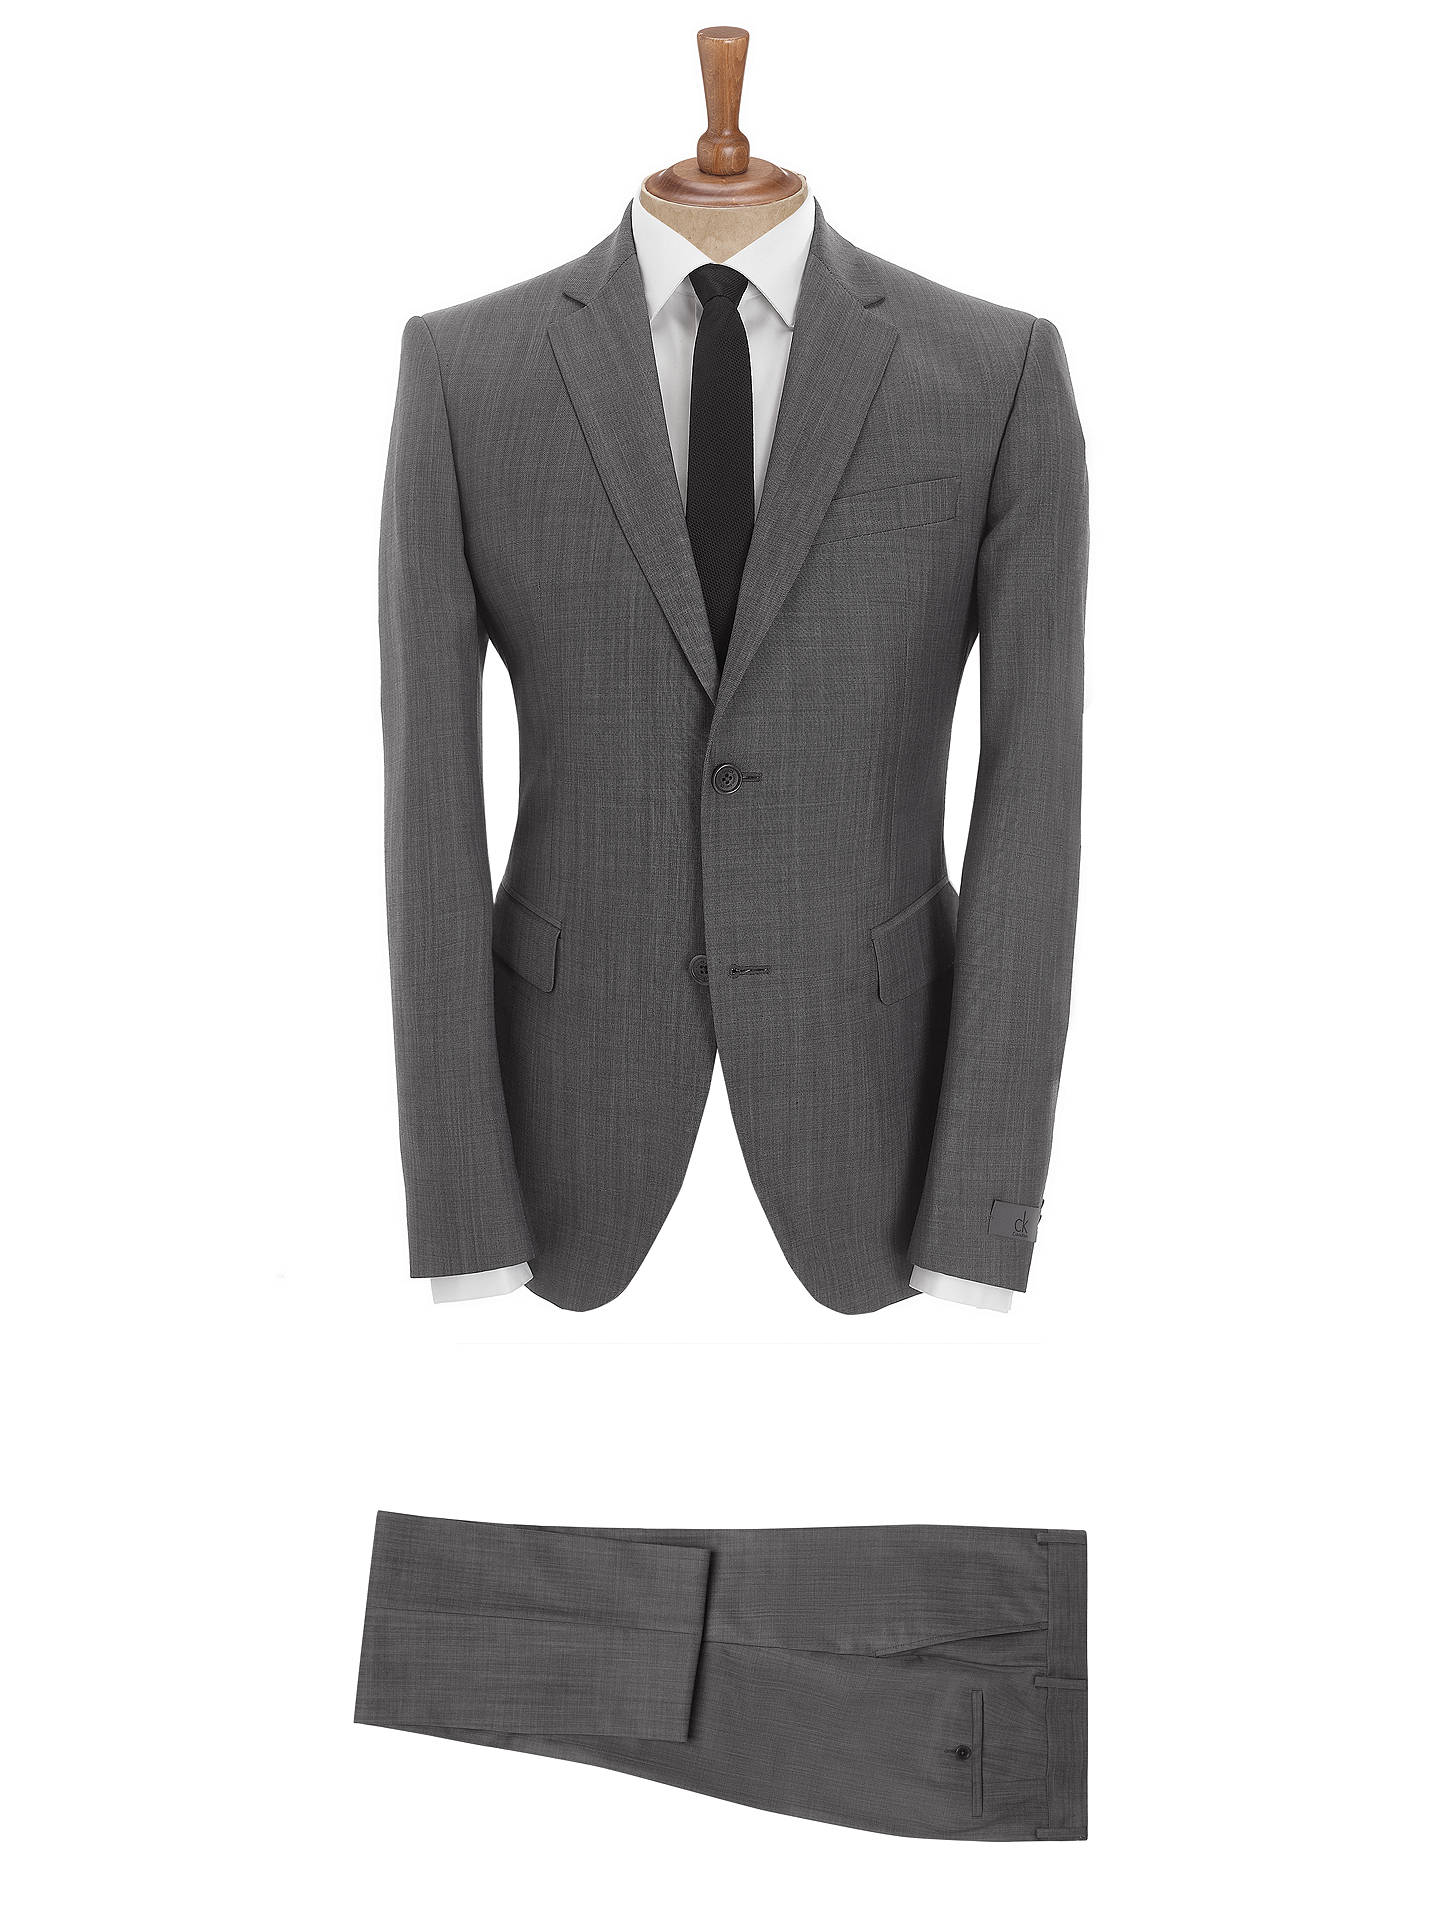 4320a99d4ad6 Buy CK Calvin Klein Shine Wool Gabardine Suit, Mid Grey, 38R Online at  johnlewis ...